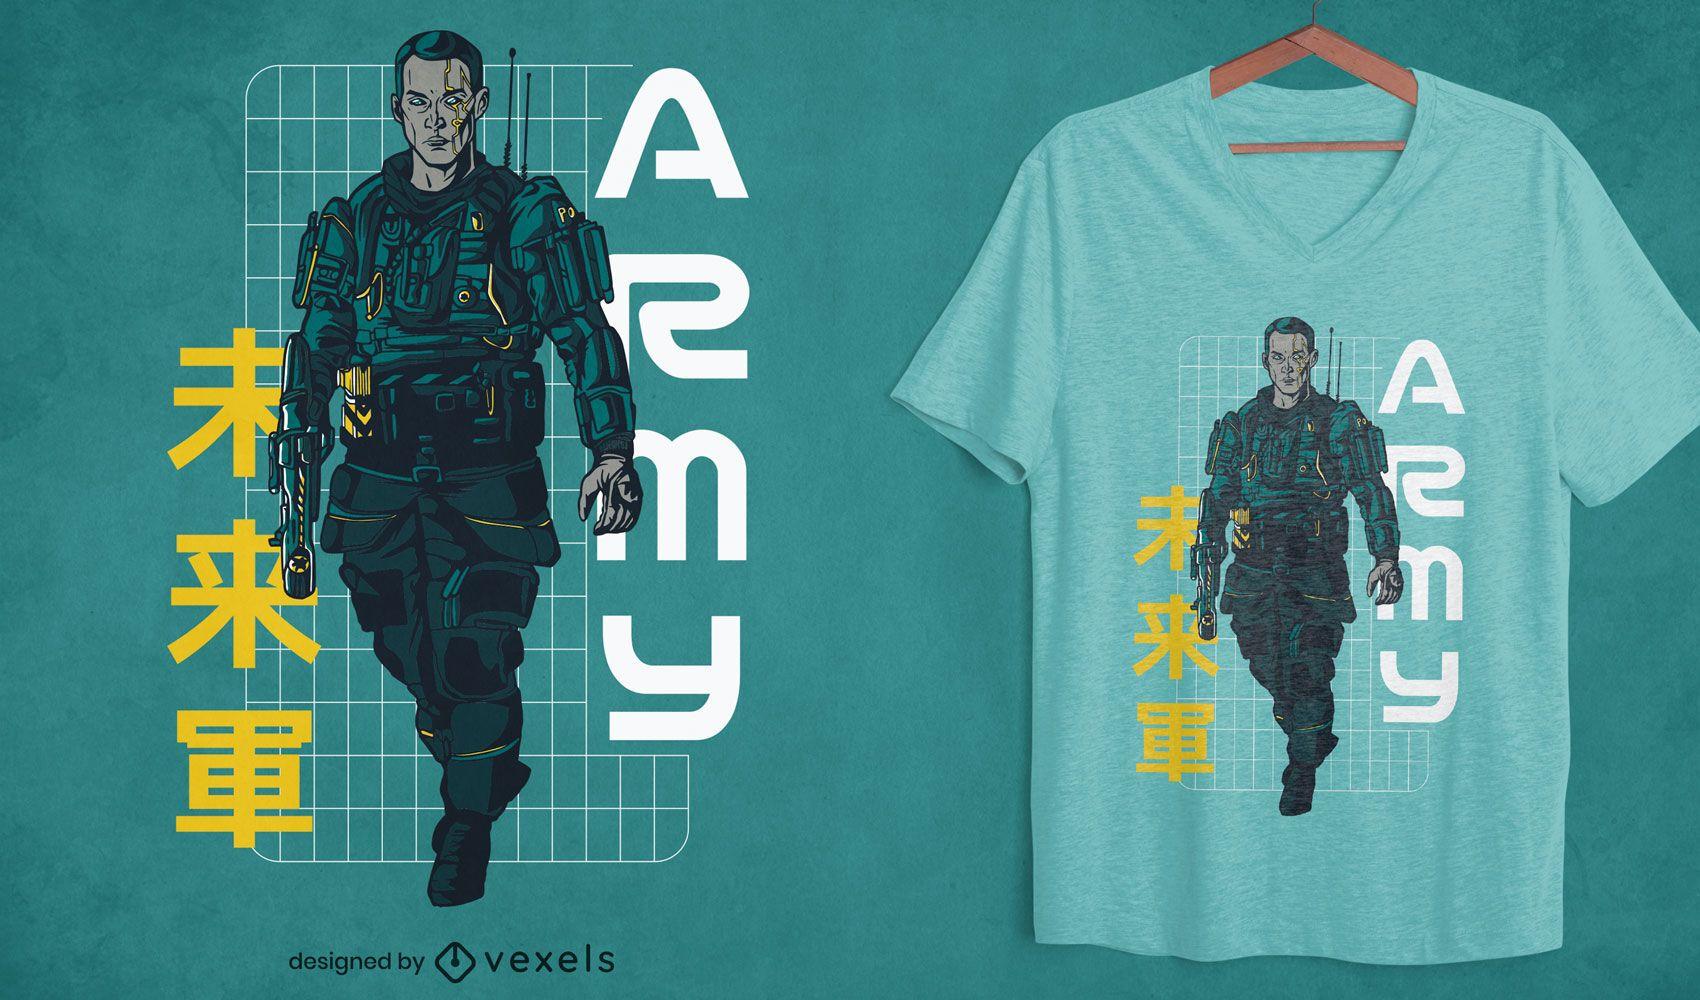 Futuristic sheriff character t-shirt design